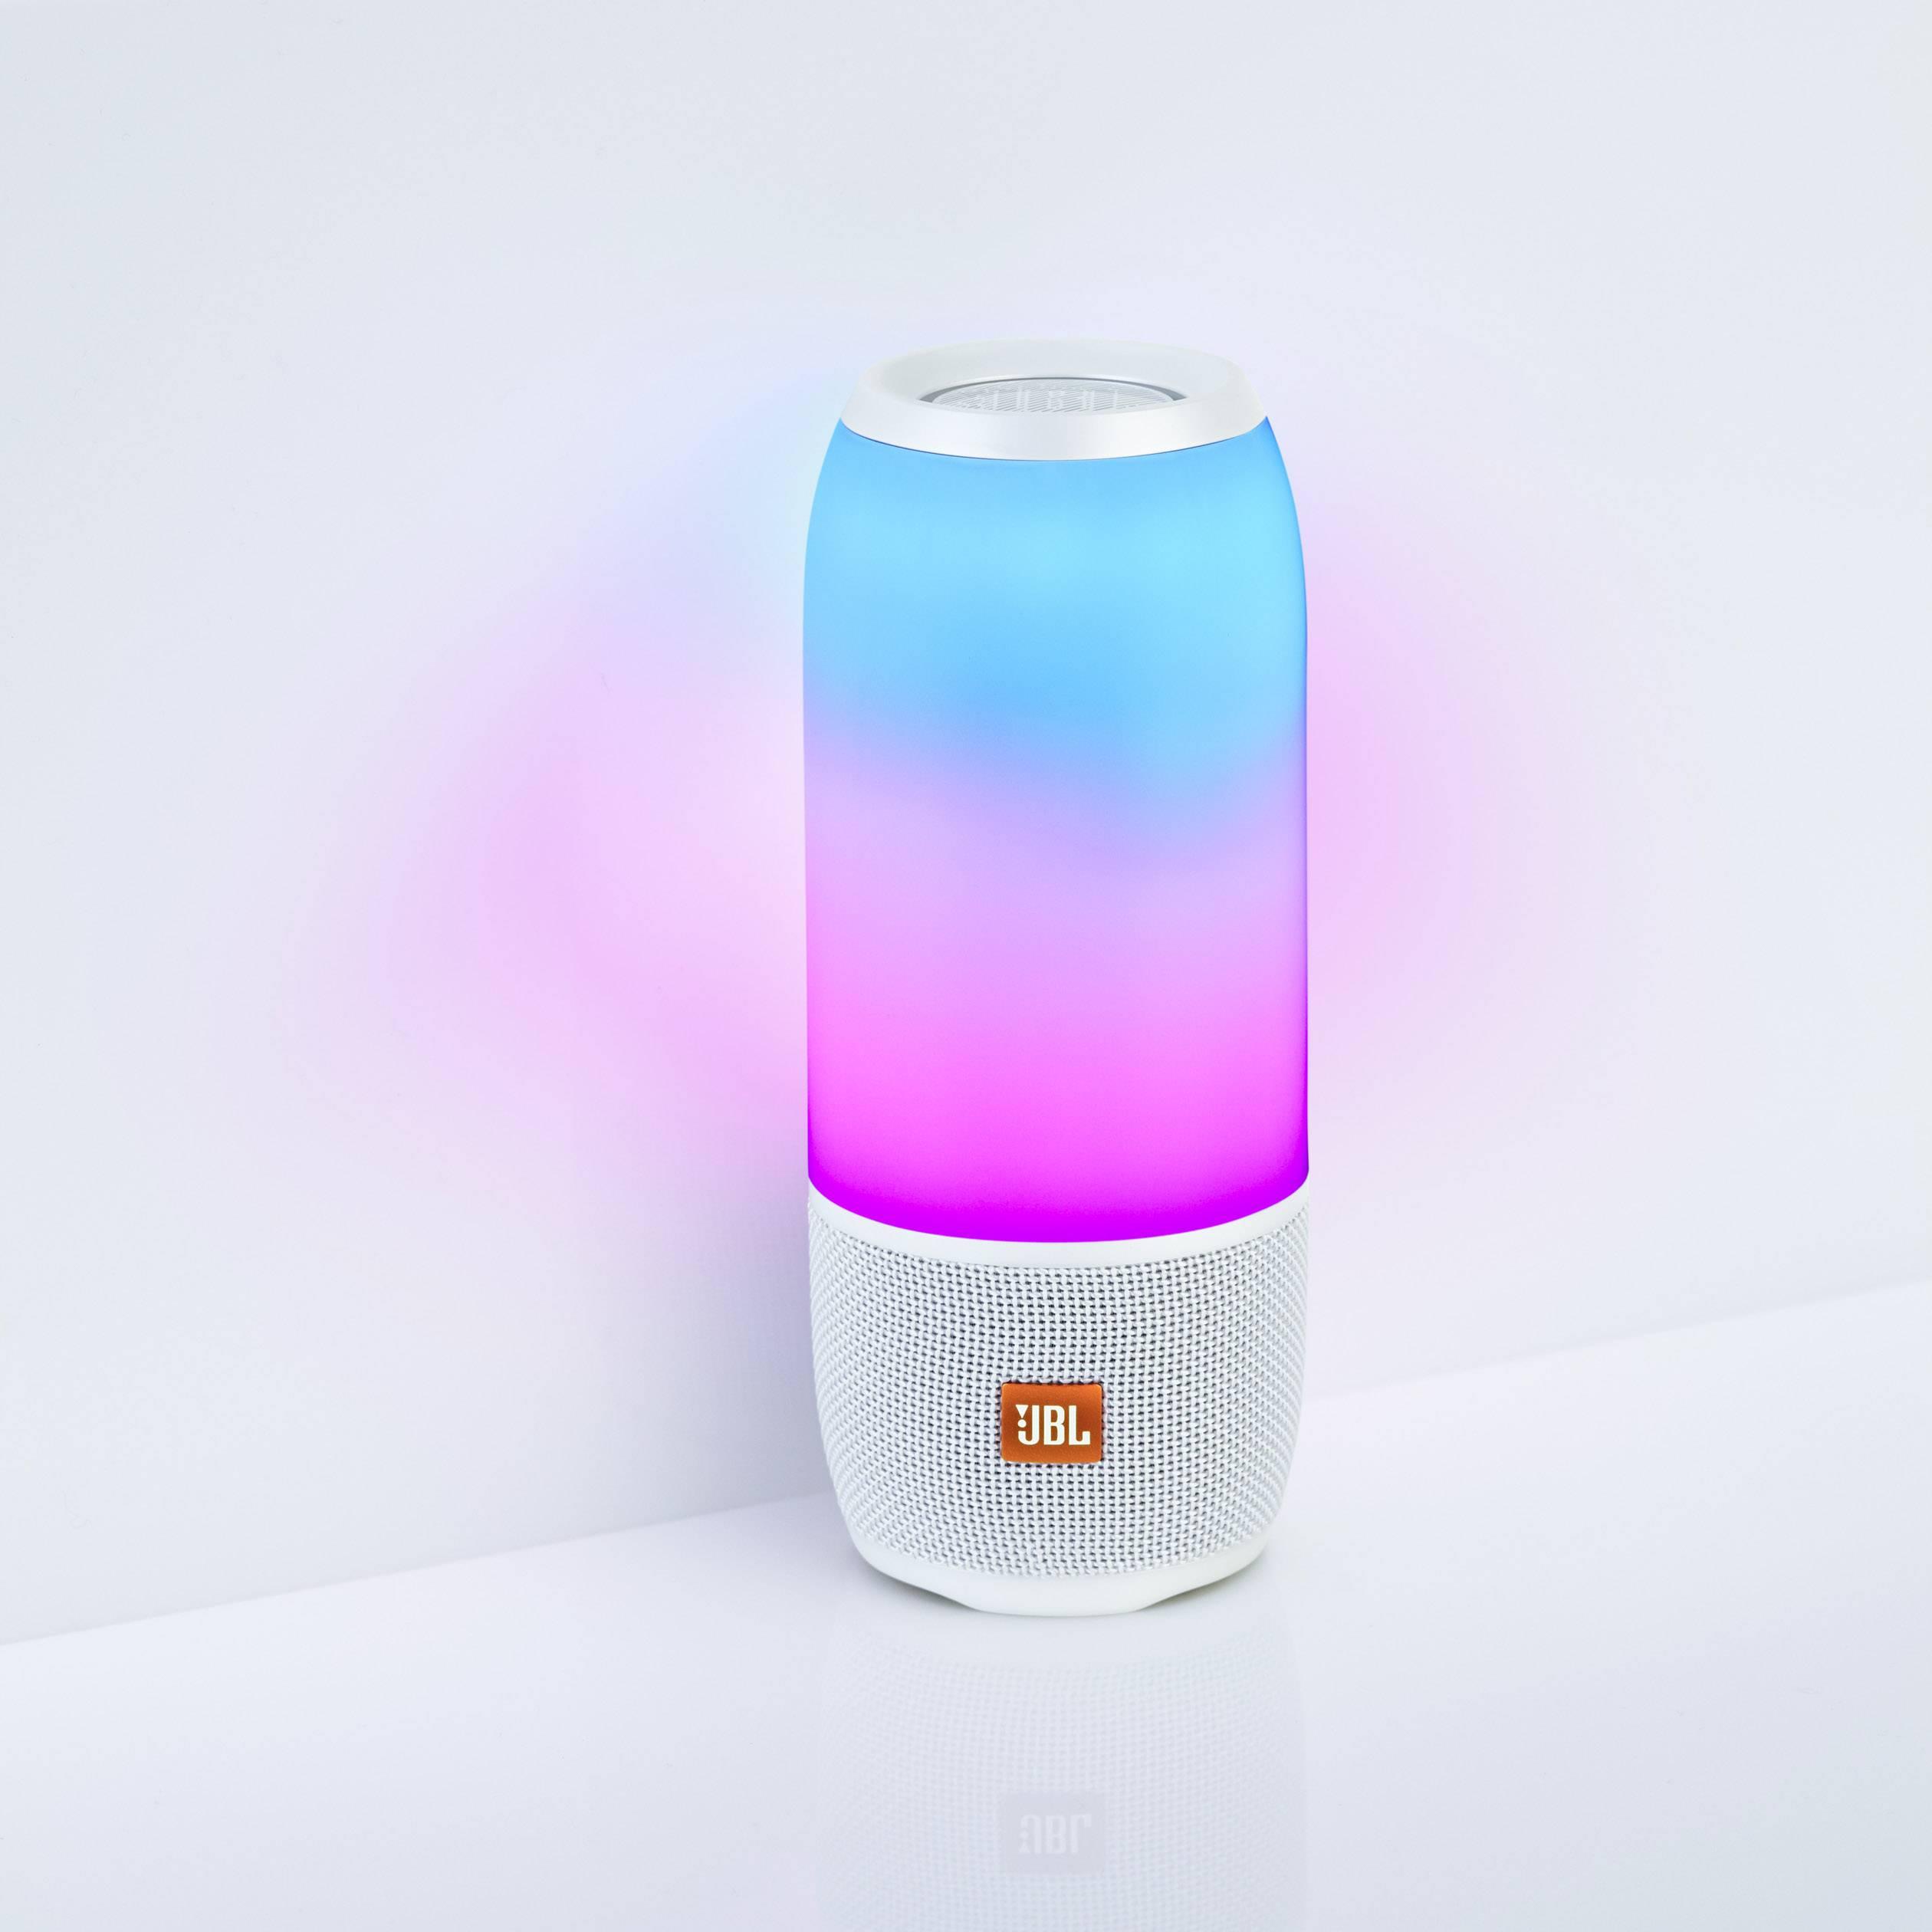 Bluetooth Lautsprecher Gnstig Online Kaufen Bei Conrad Jbl Speaker Flip Iii Pink Pulse 3 Freisprechfunktion Outdoor Wasserfest Wei